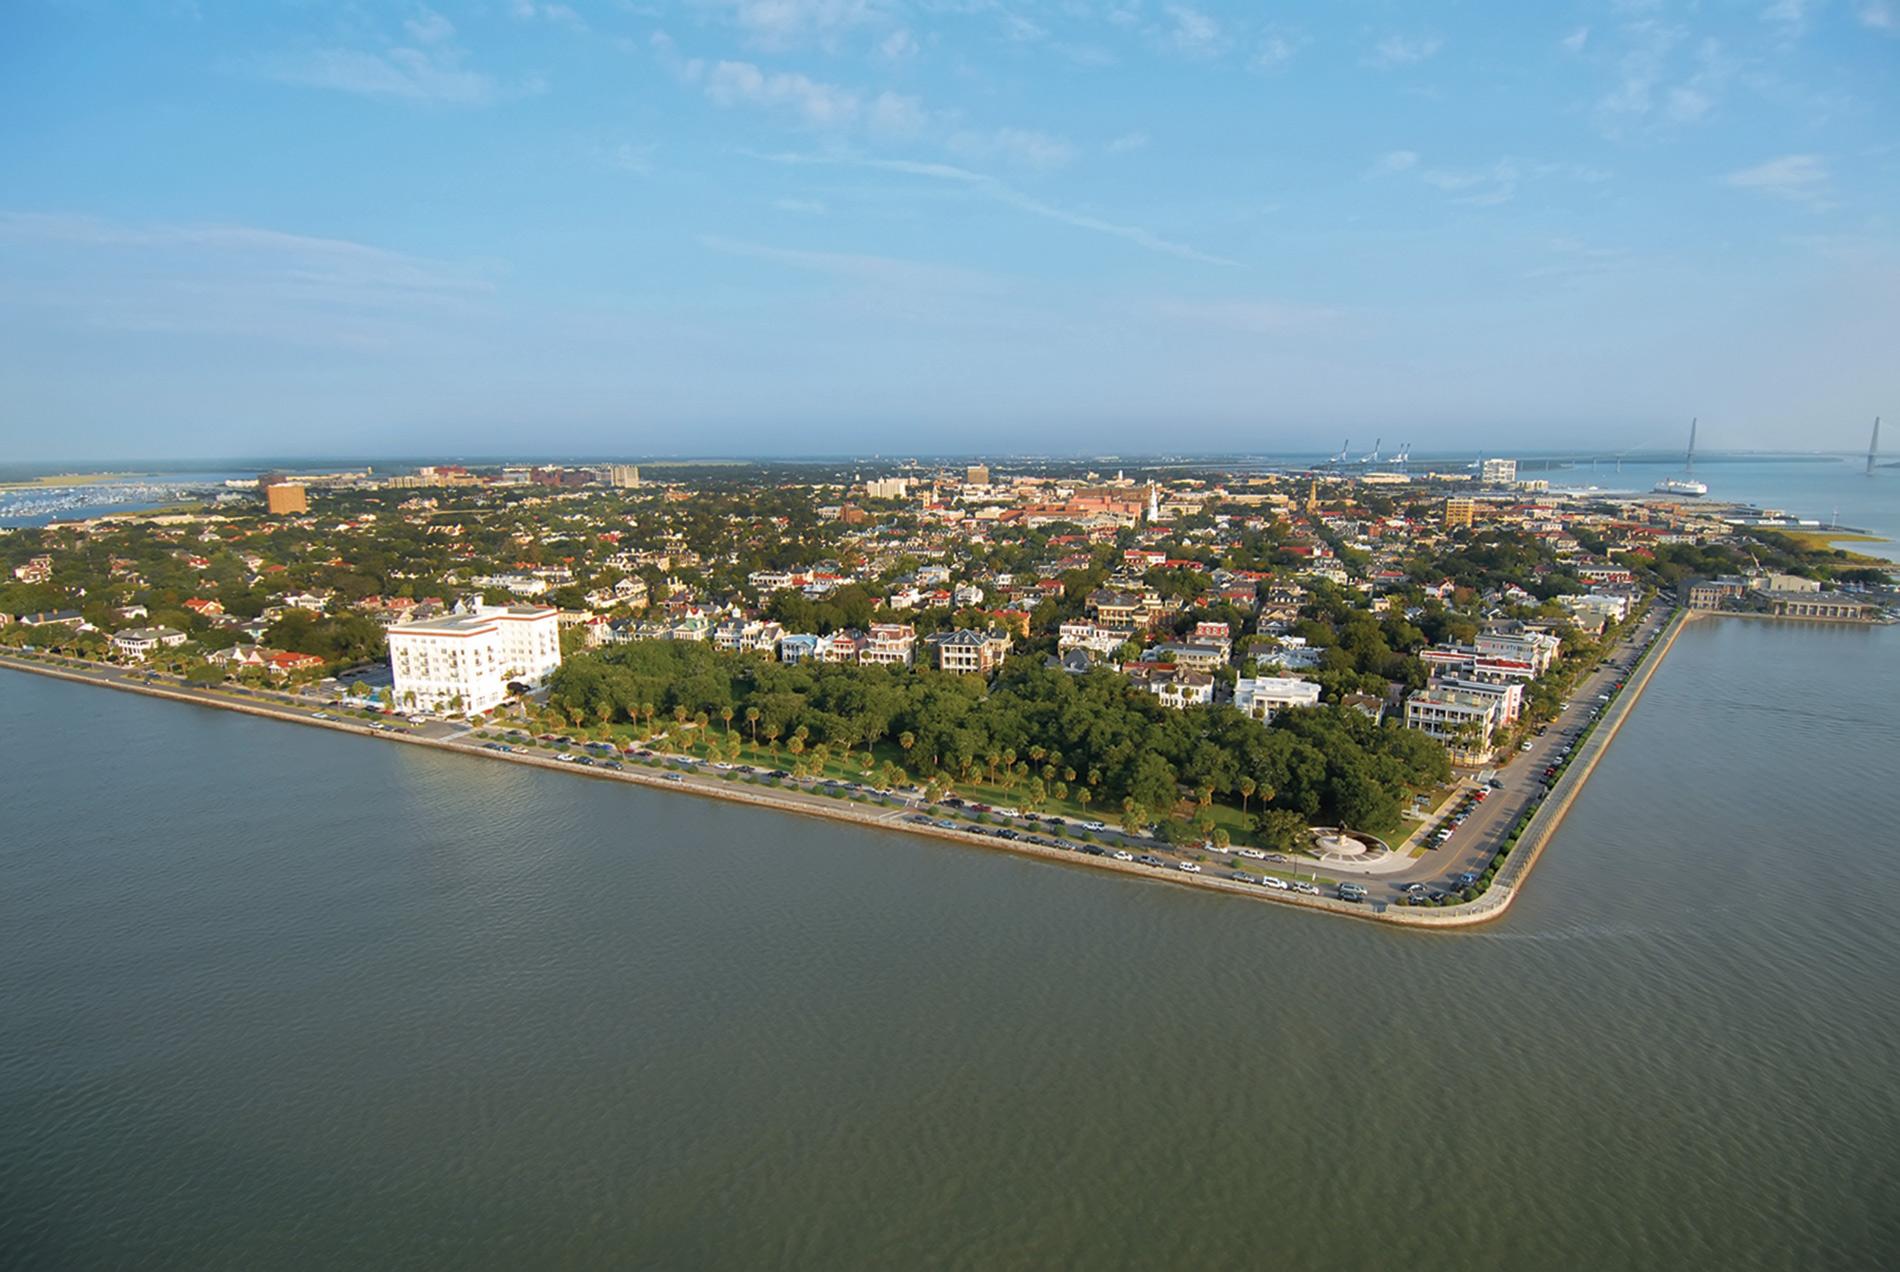 peninsula aerial